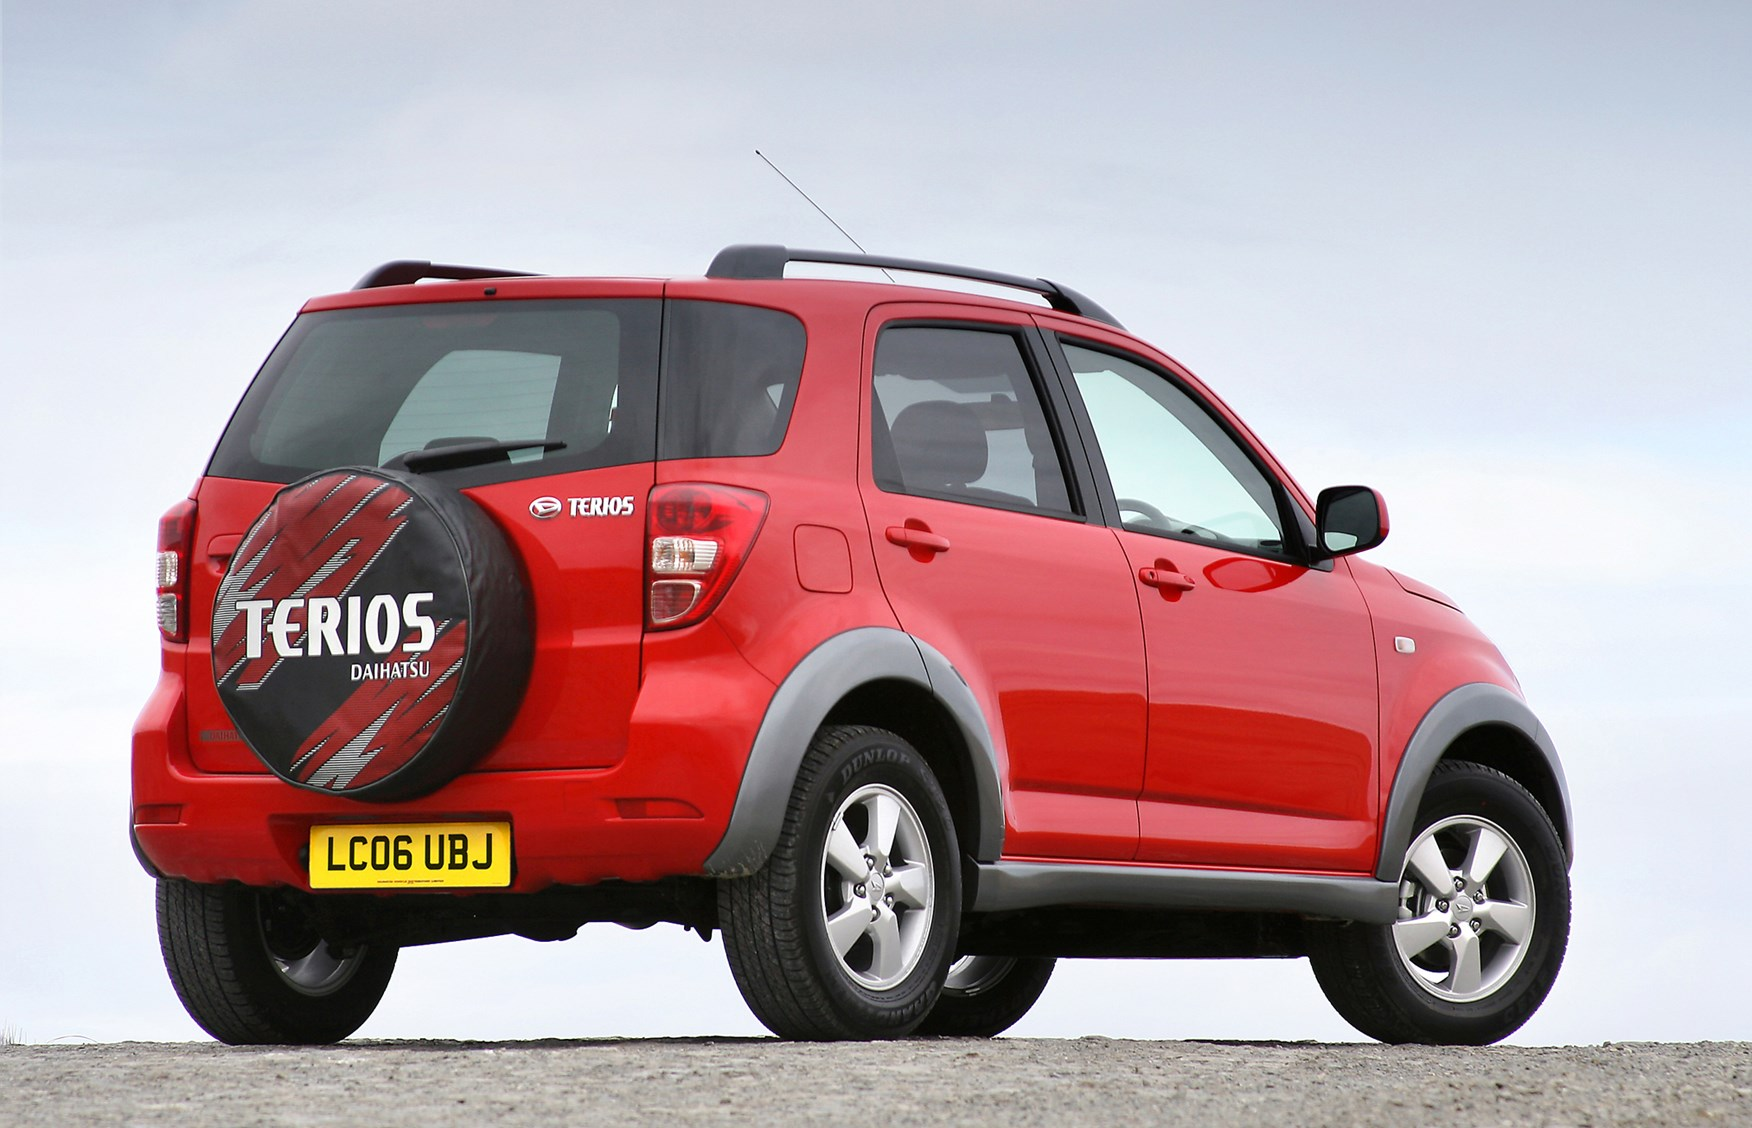 Cheapest Auto Insurance >> Daihatsu Terios Estate Review (2006 - 2010) | Parkers